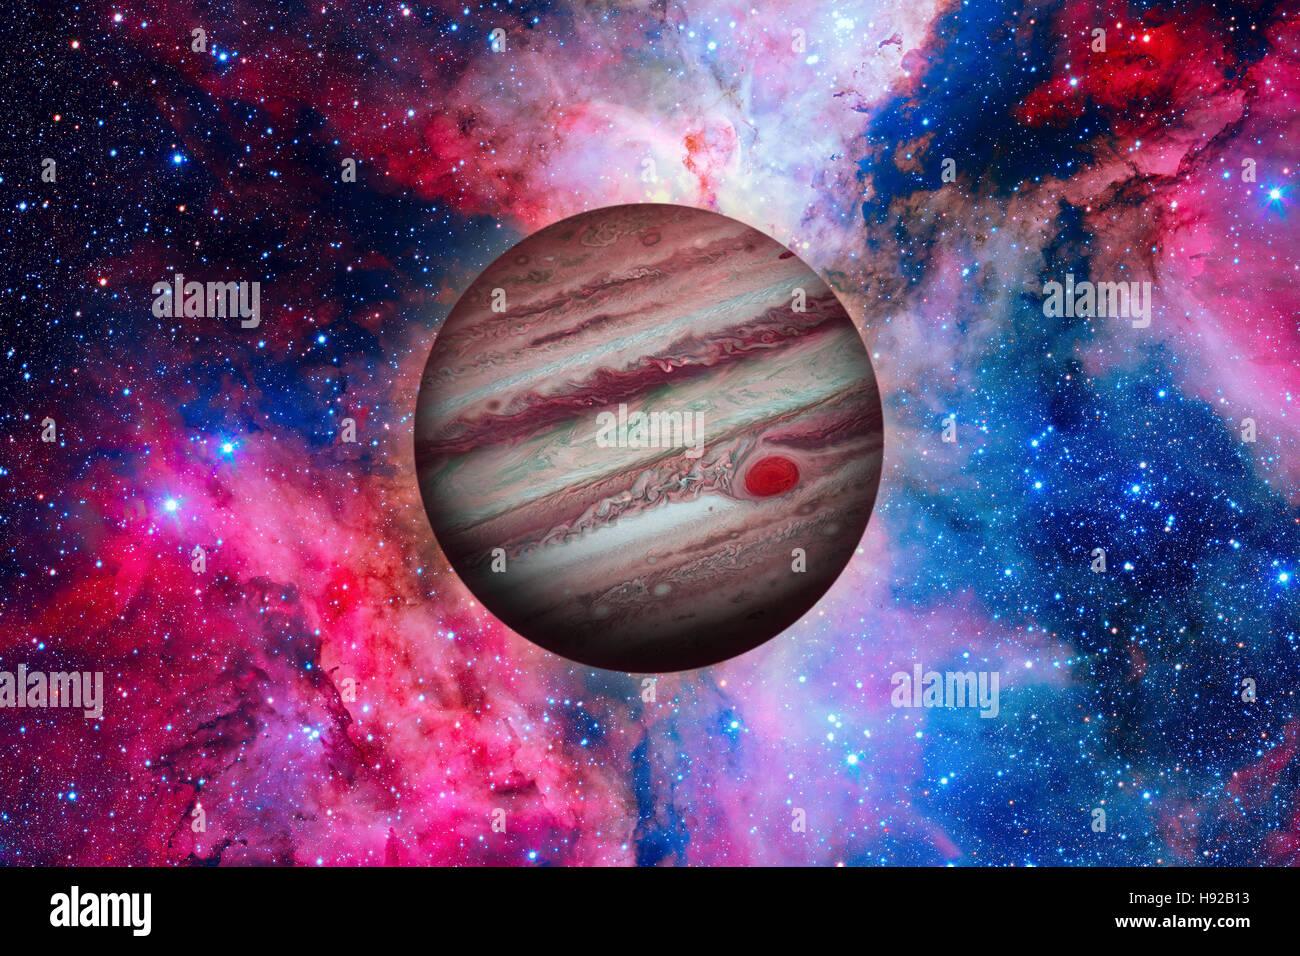 solar system jupiter planet - photo #37